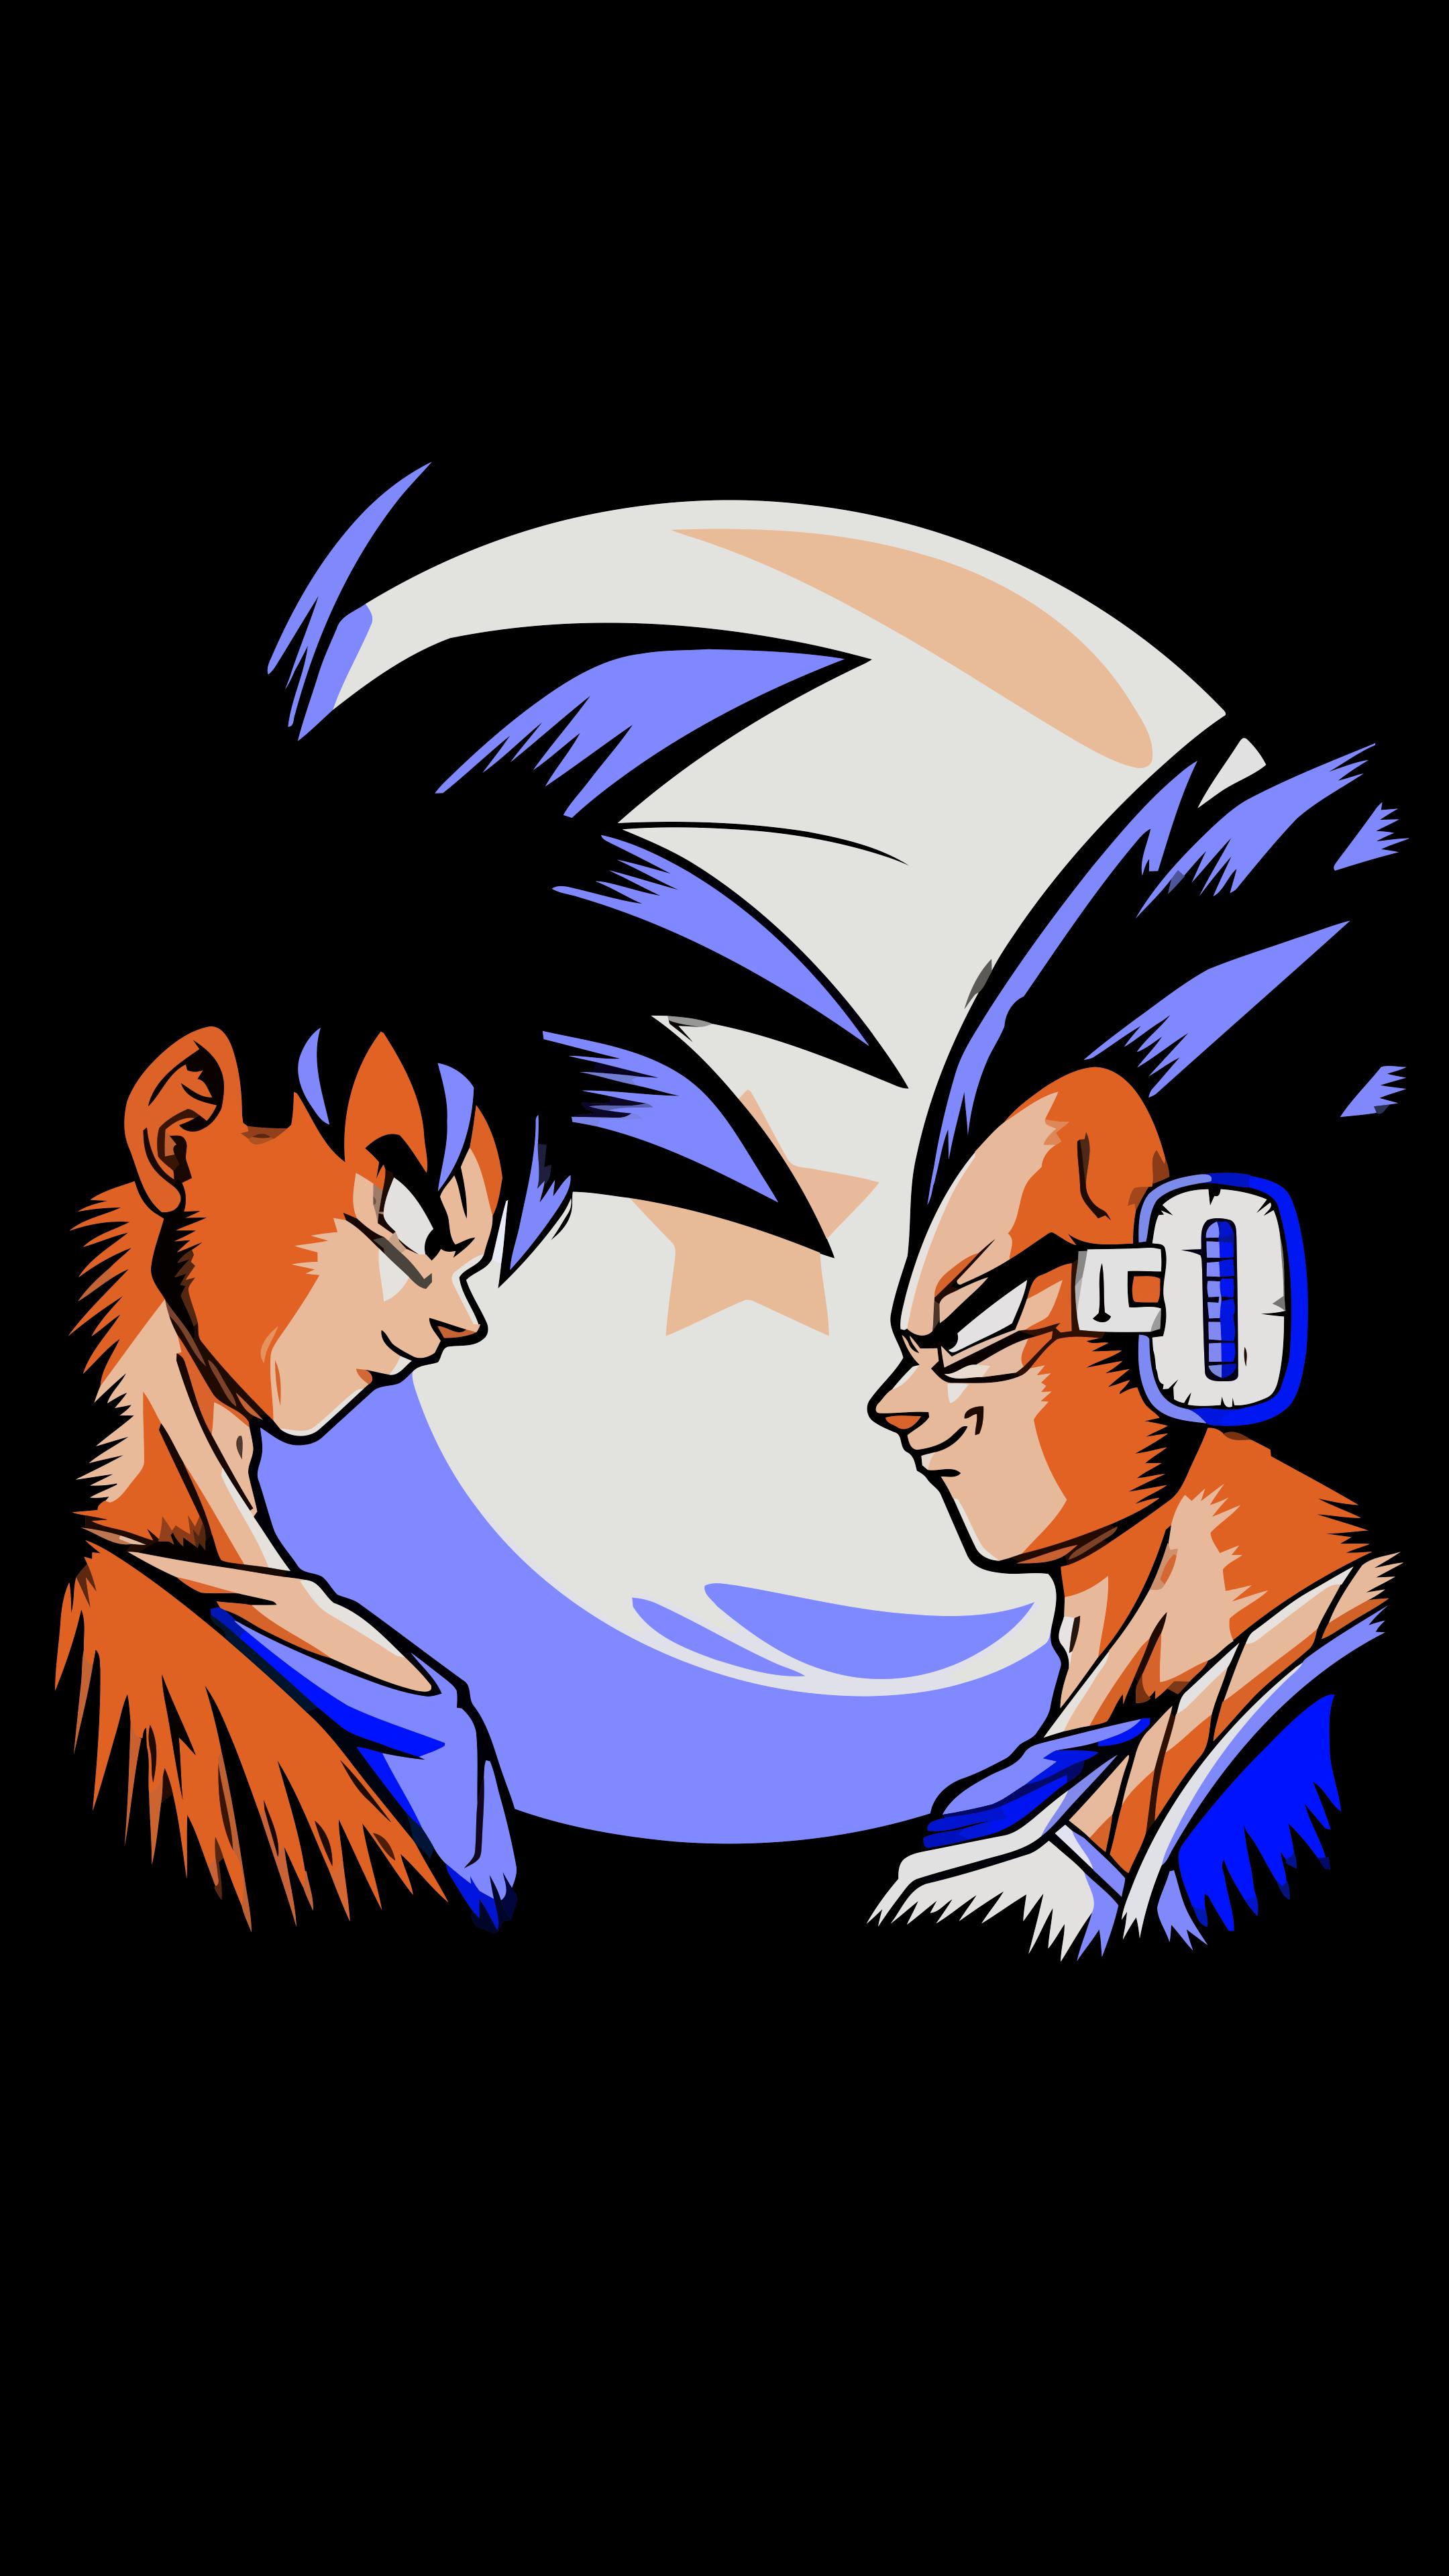 Goku Vs Vegeta Wallpapers Top Free Goku Vs Vegeta Backgrounds Wallpaperaccess